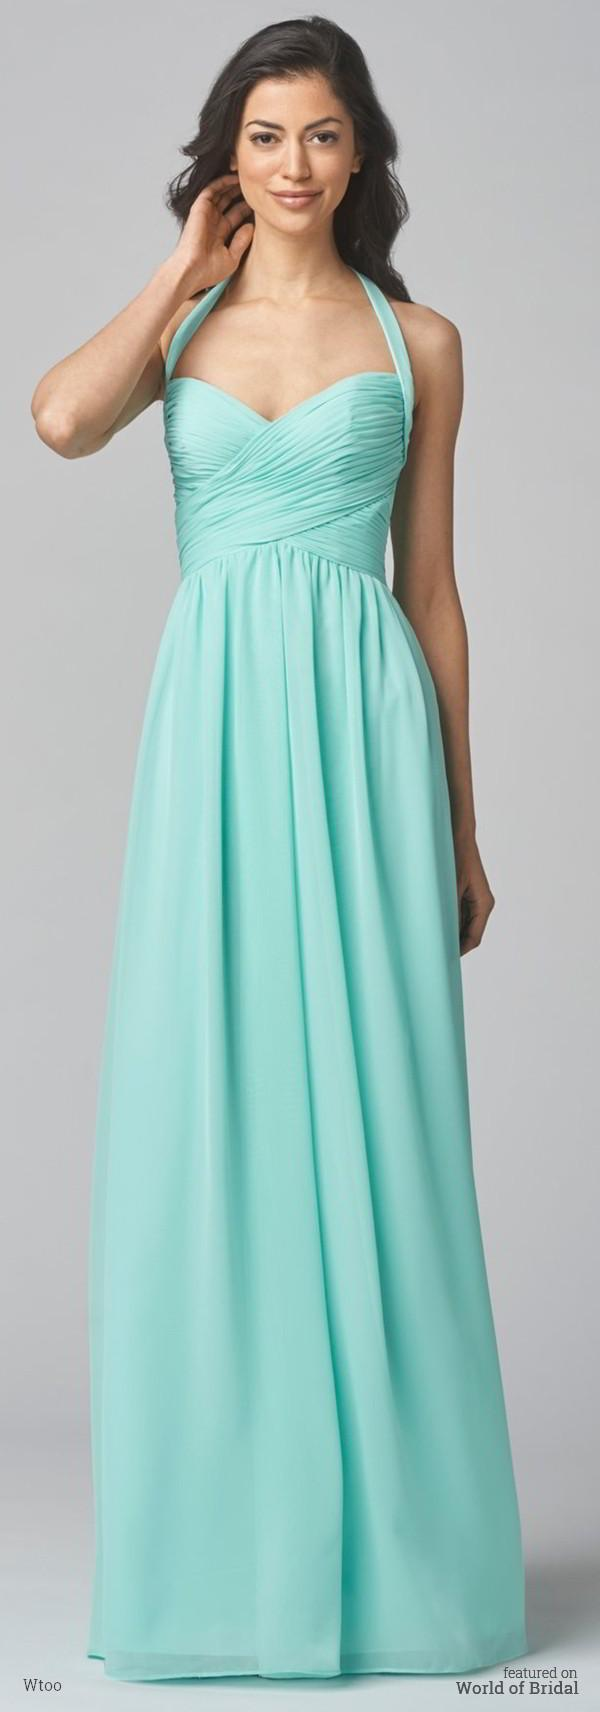 Свадьба - Wtoo Fall 2015 Bridesmaids Dresses